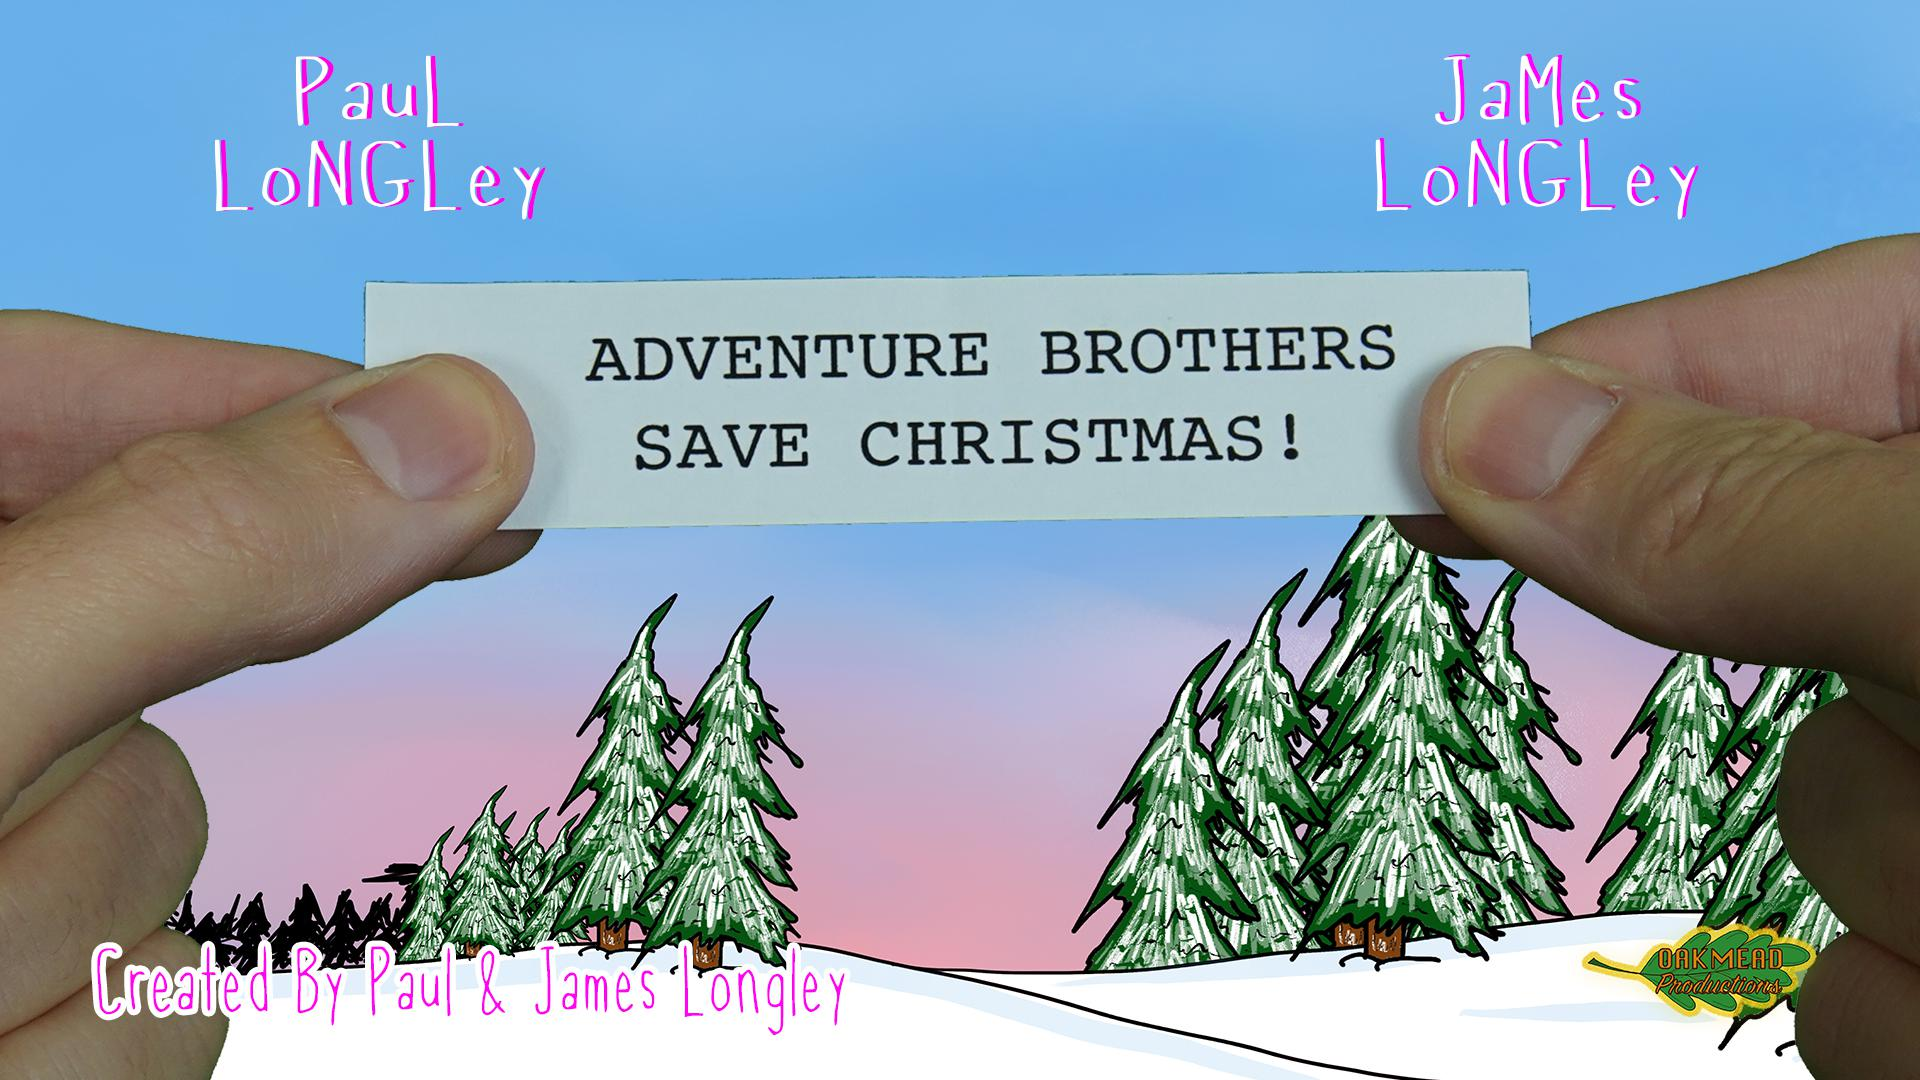 Adventure Brothers Save Christmas!